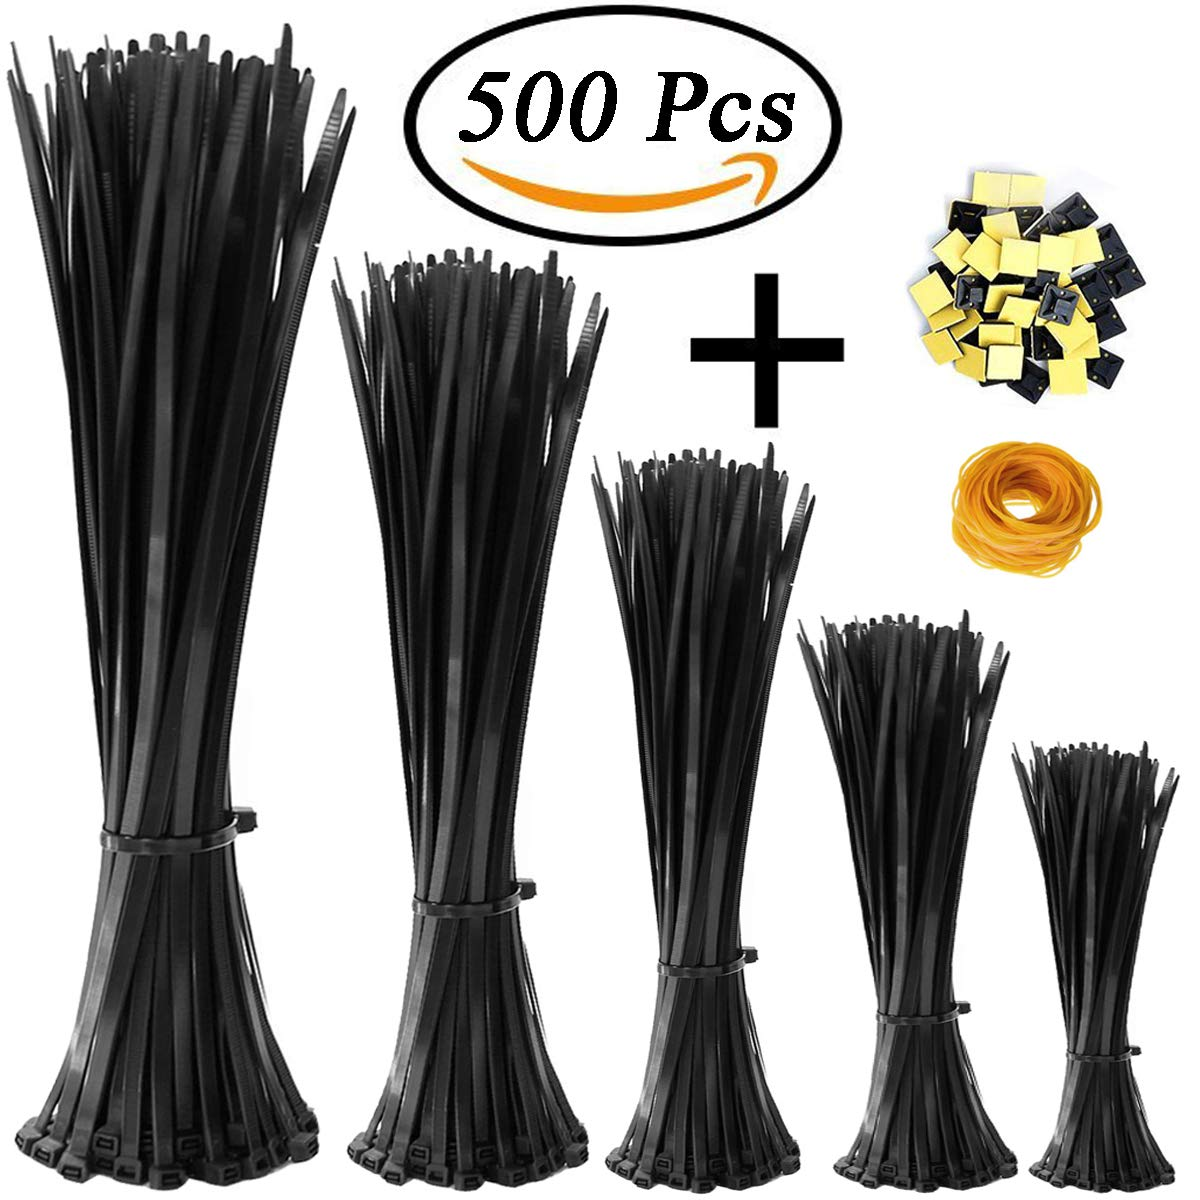 KASZOO Zip Ties 500 Pcs Nylon Cable Zip Ties with Self-Locking 4/6/8/10/12 Inch Black UV Resistant Heavy Duty